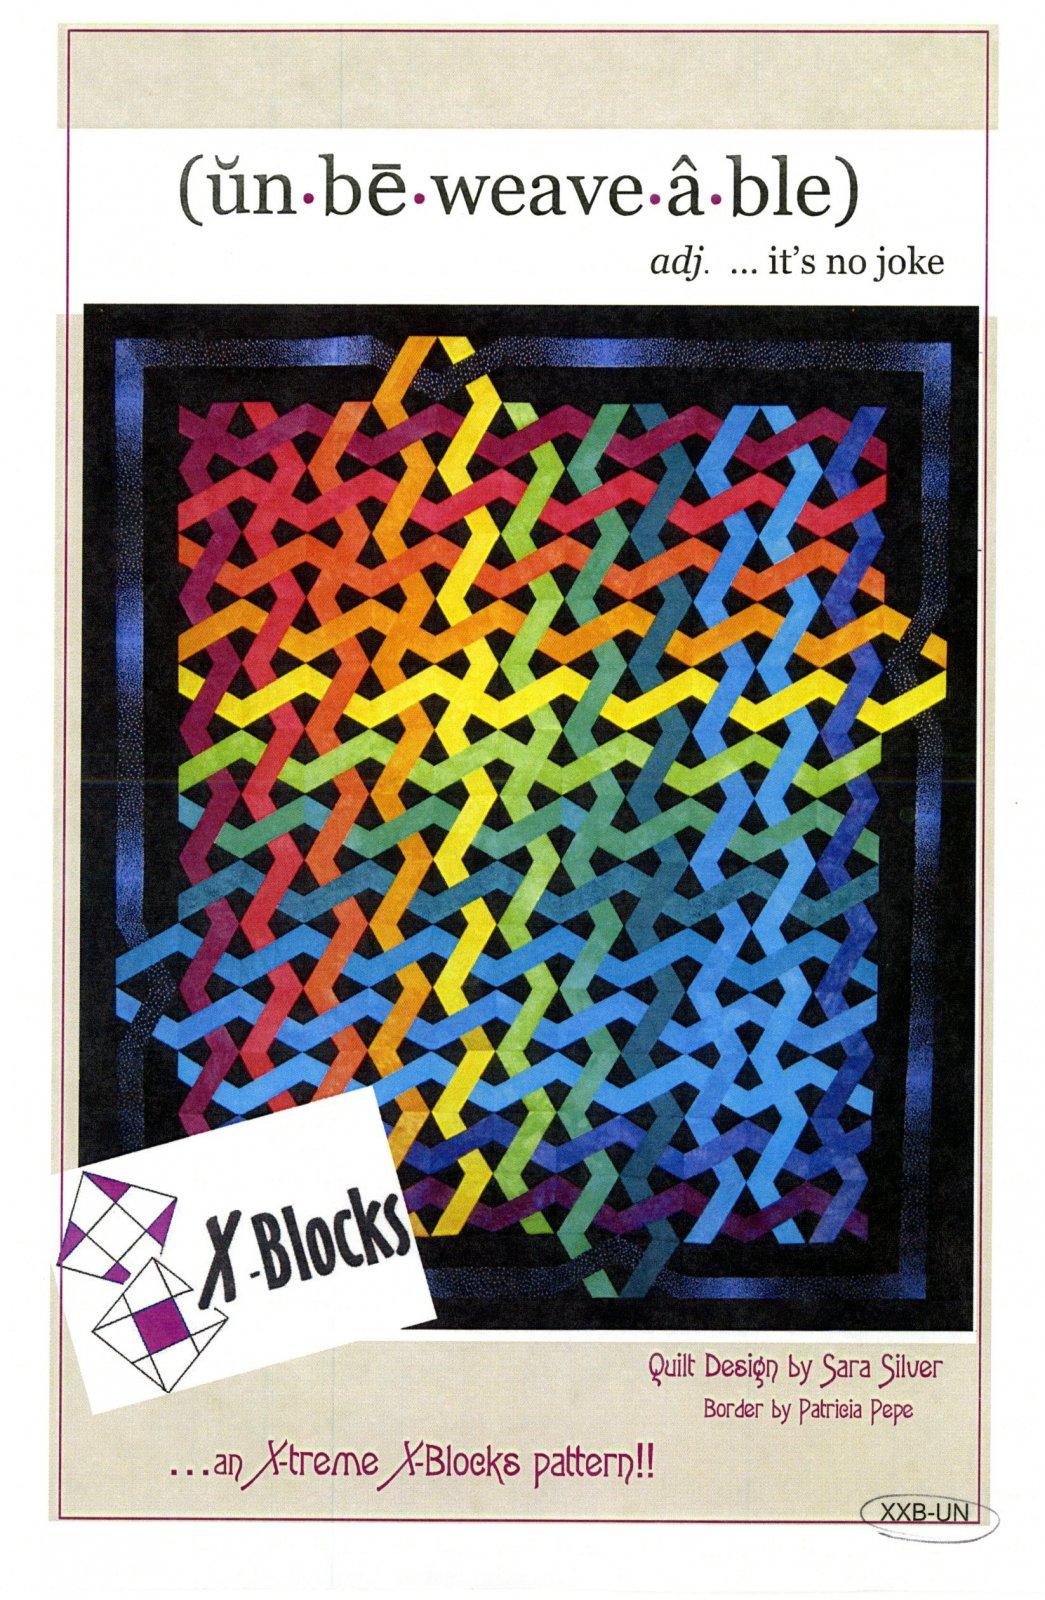 X-Blocks Unbeweavable